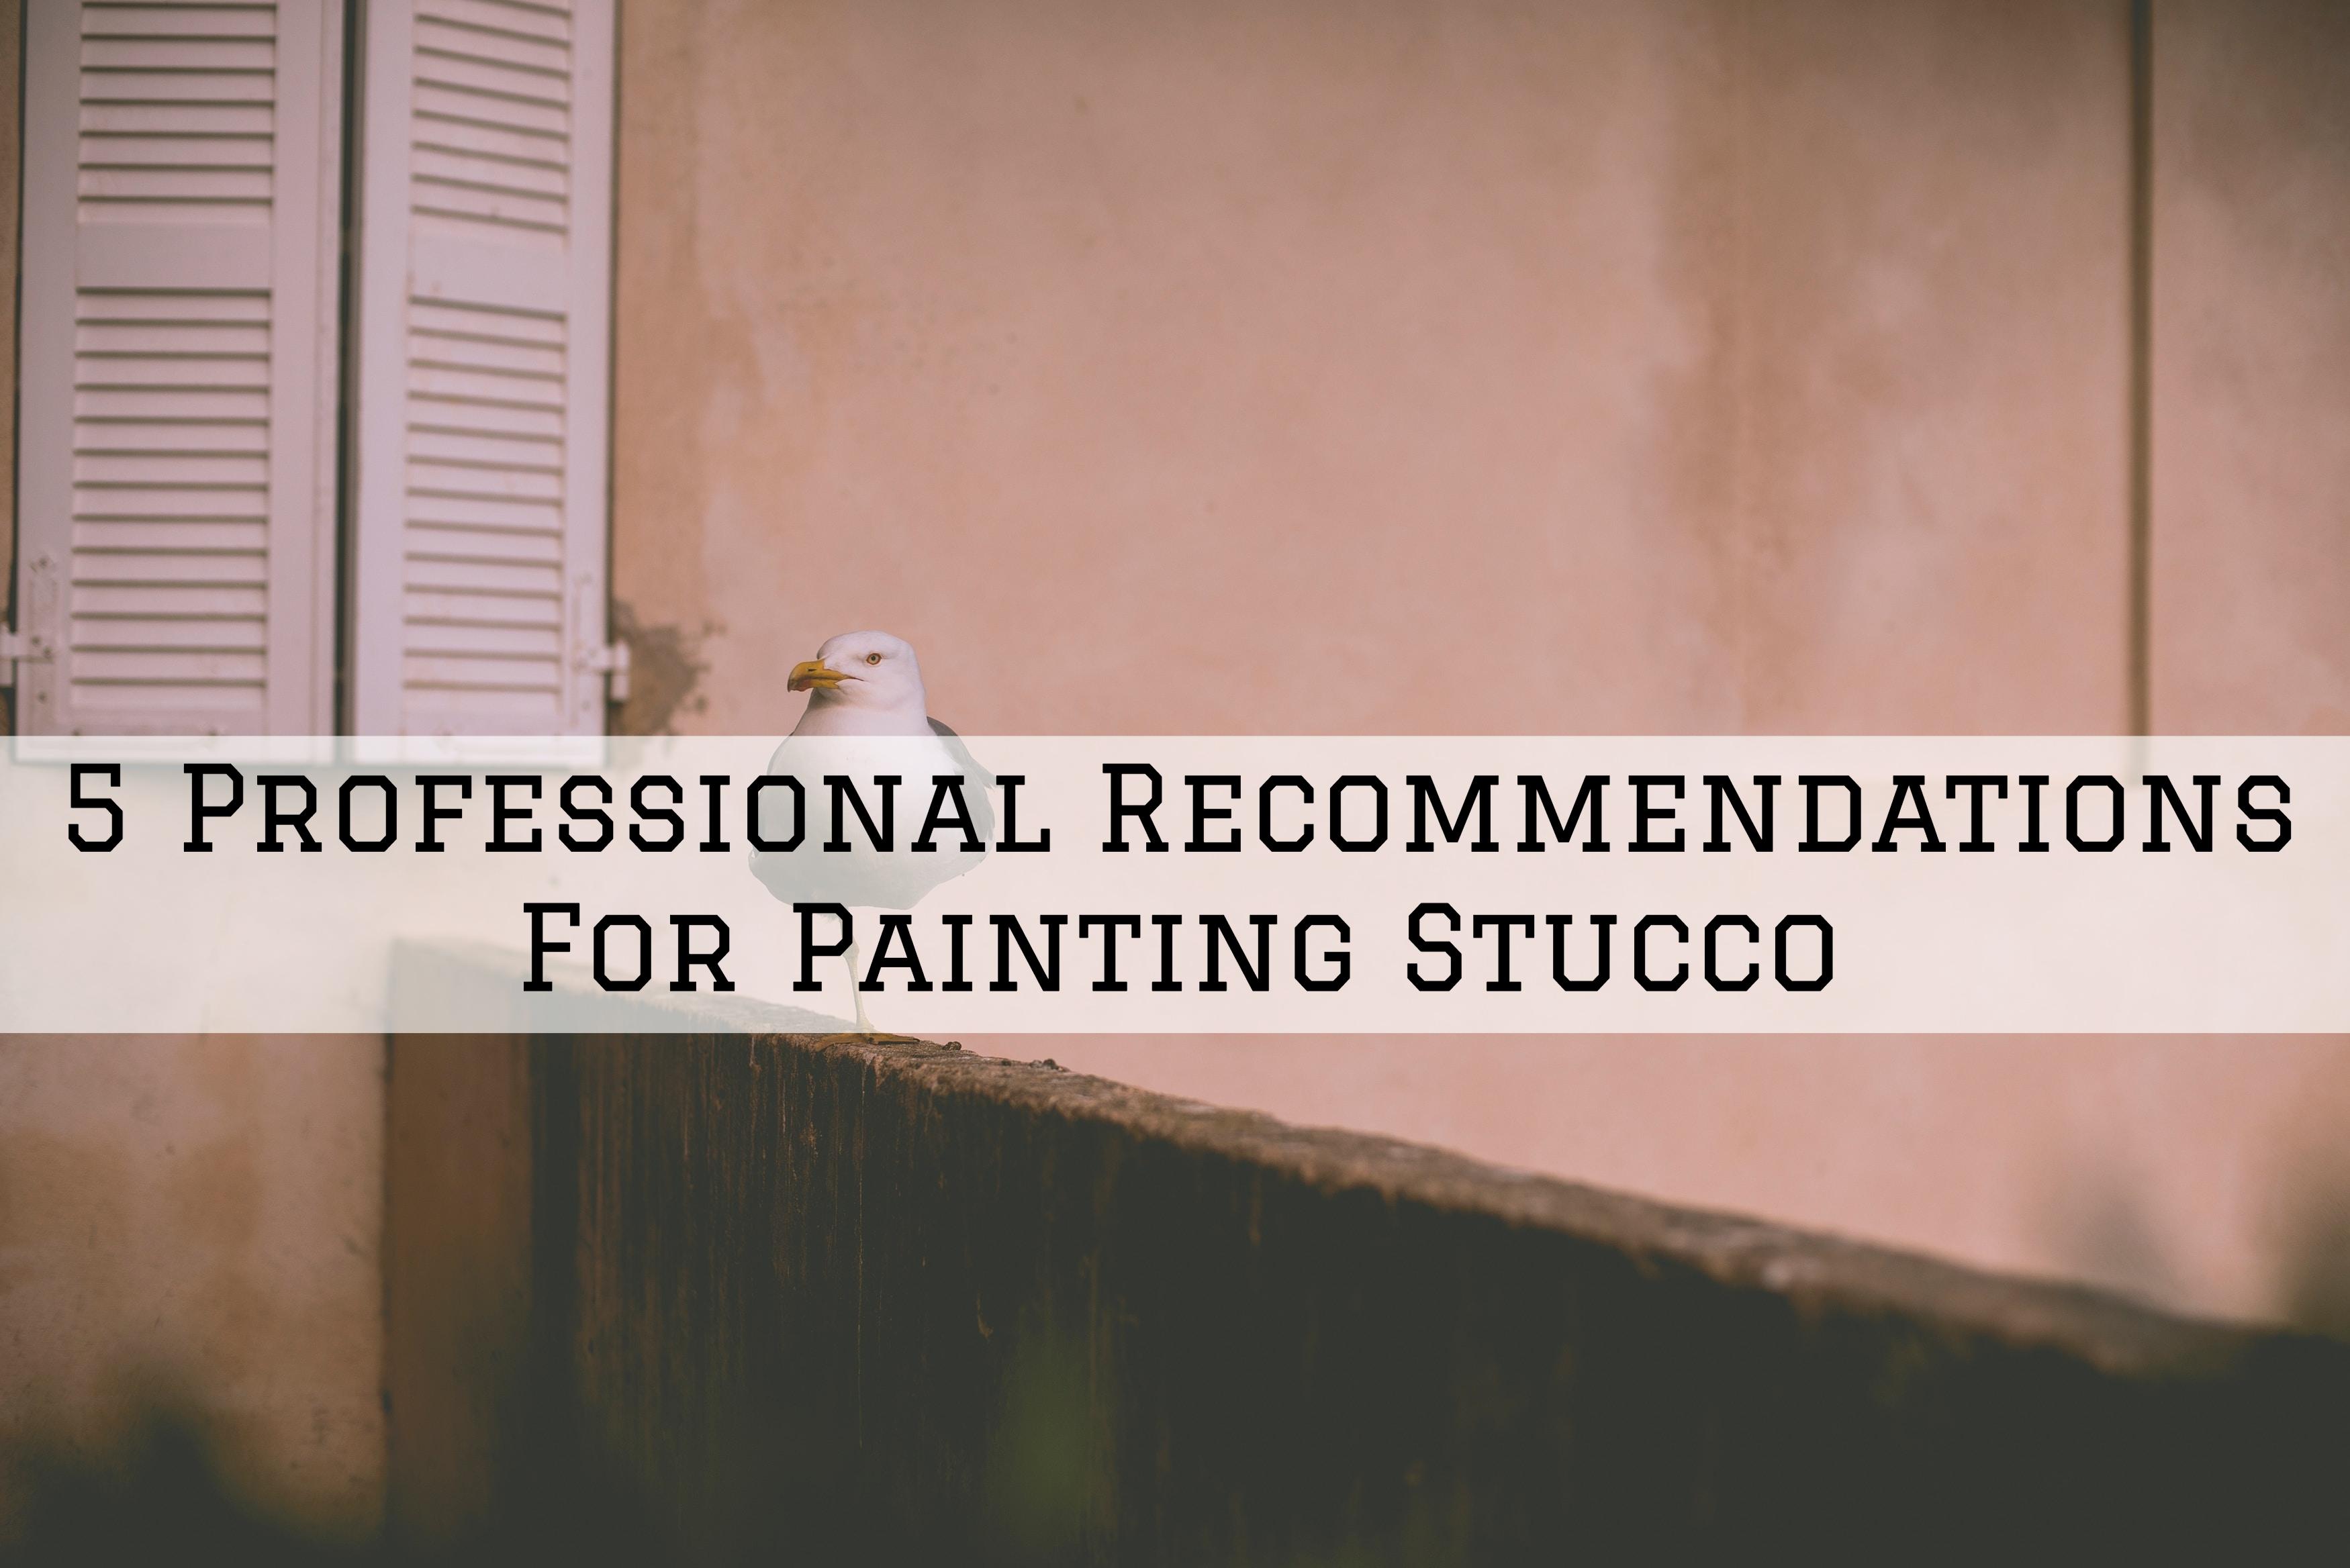 2020-01-23 Selah Painting St. Louis MO Painting Stucco